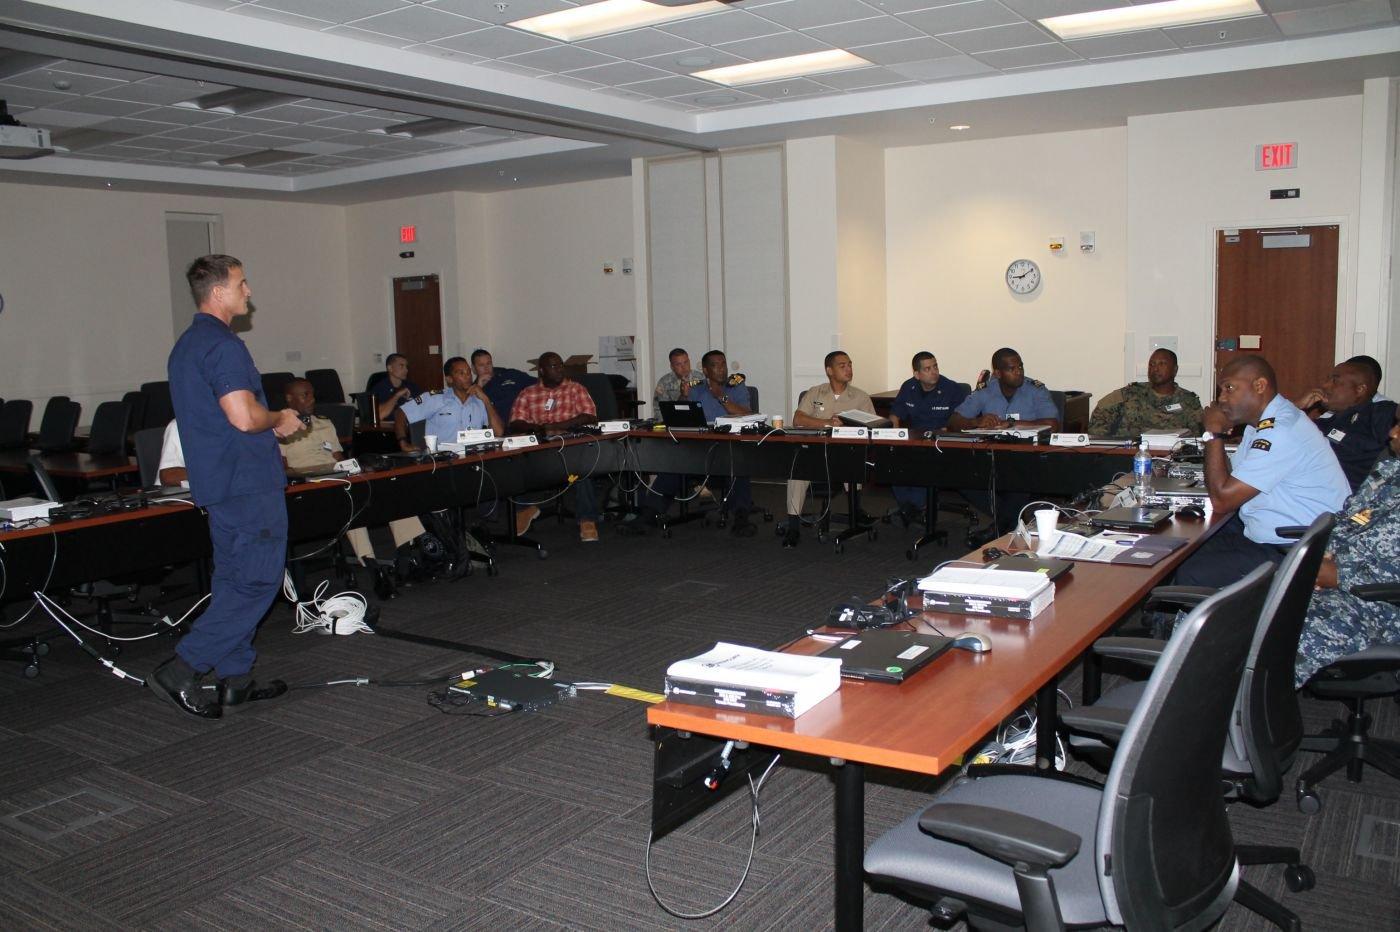 Caribbean Partners and SOUTHCOM Discuss Collaborative Counter Narcotics Program